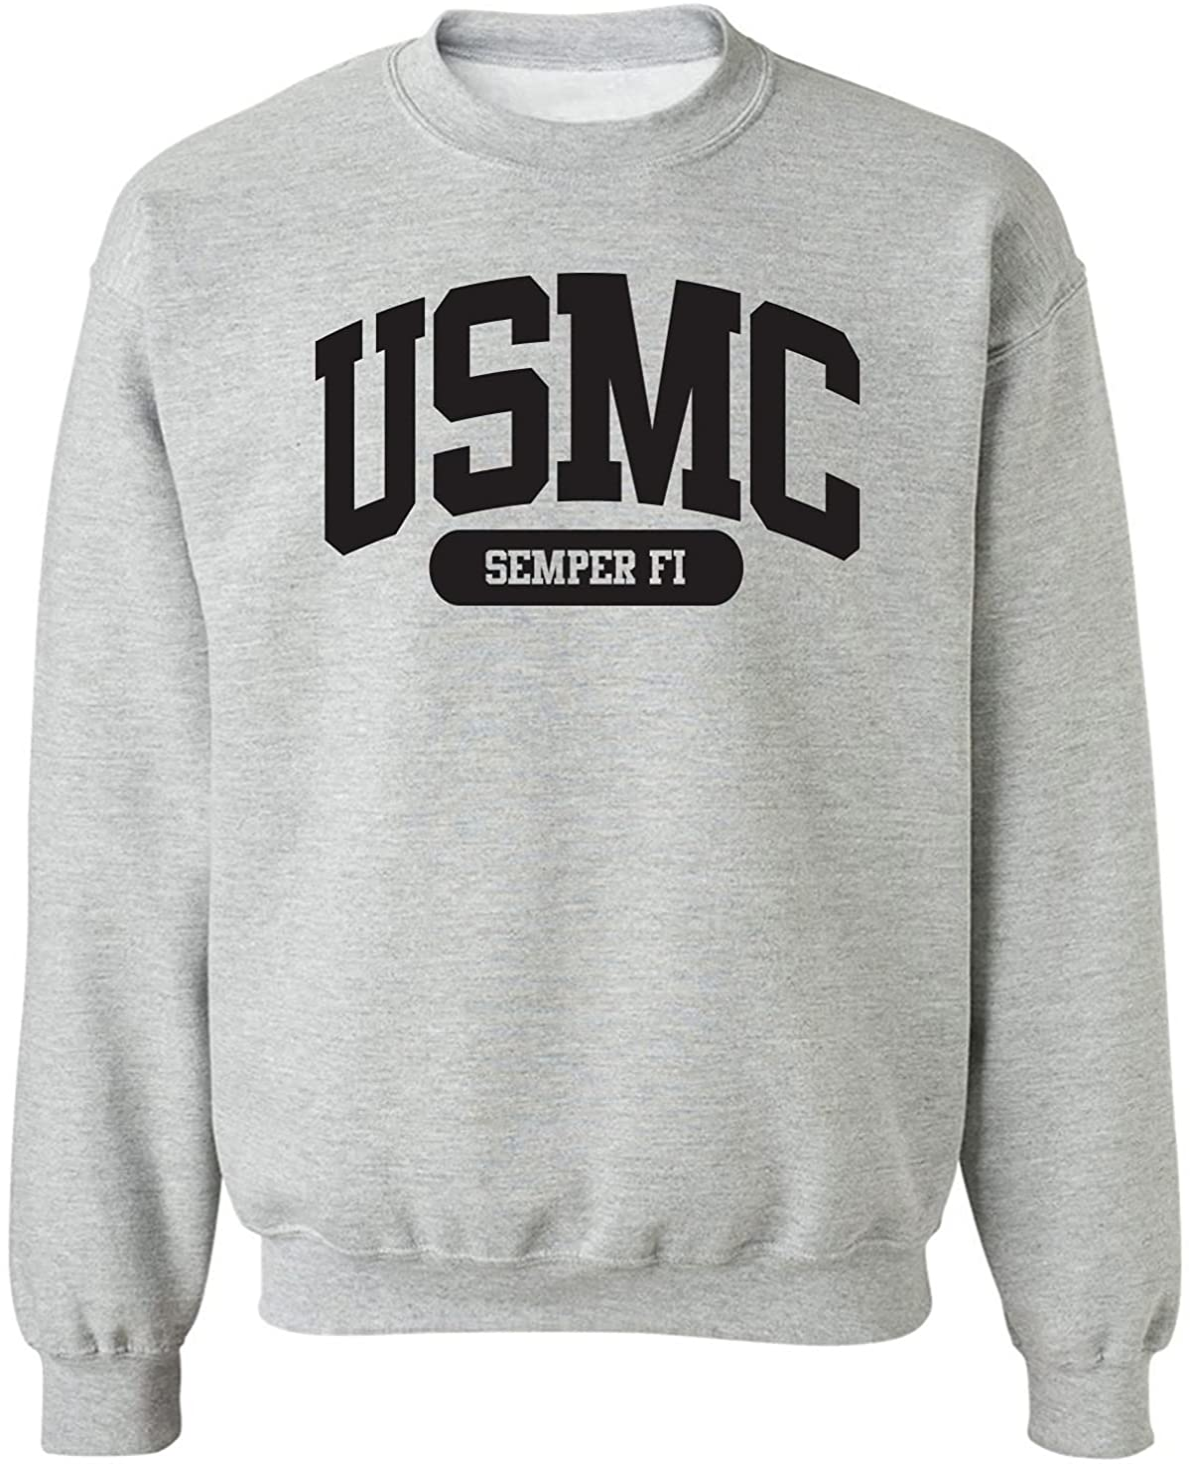 USMC Semper Popular brand Fi Inexpensive Crewneck Sport Grey Sweatshirt in